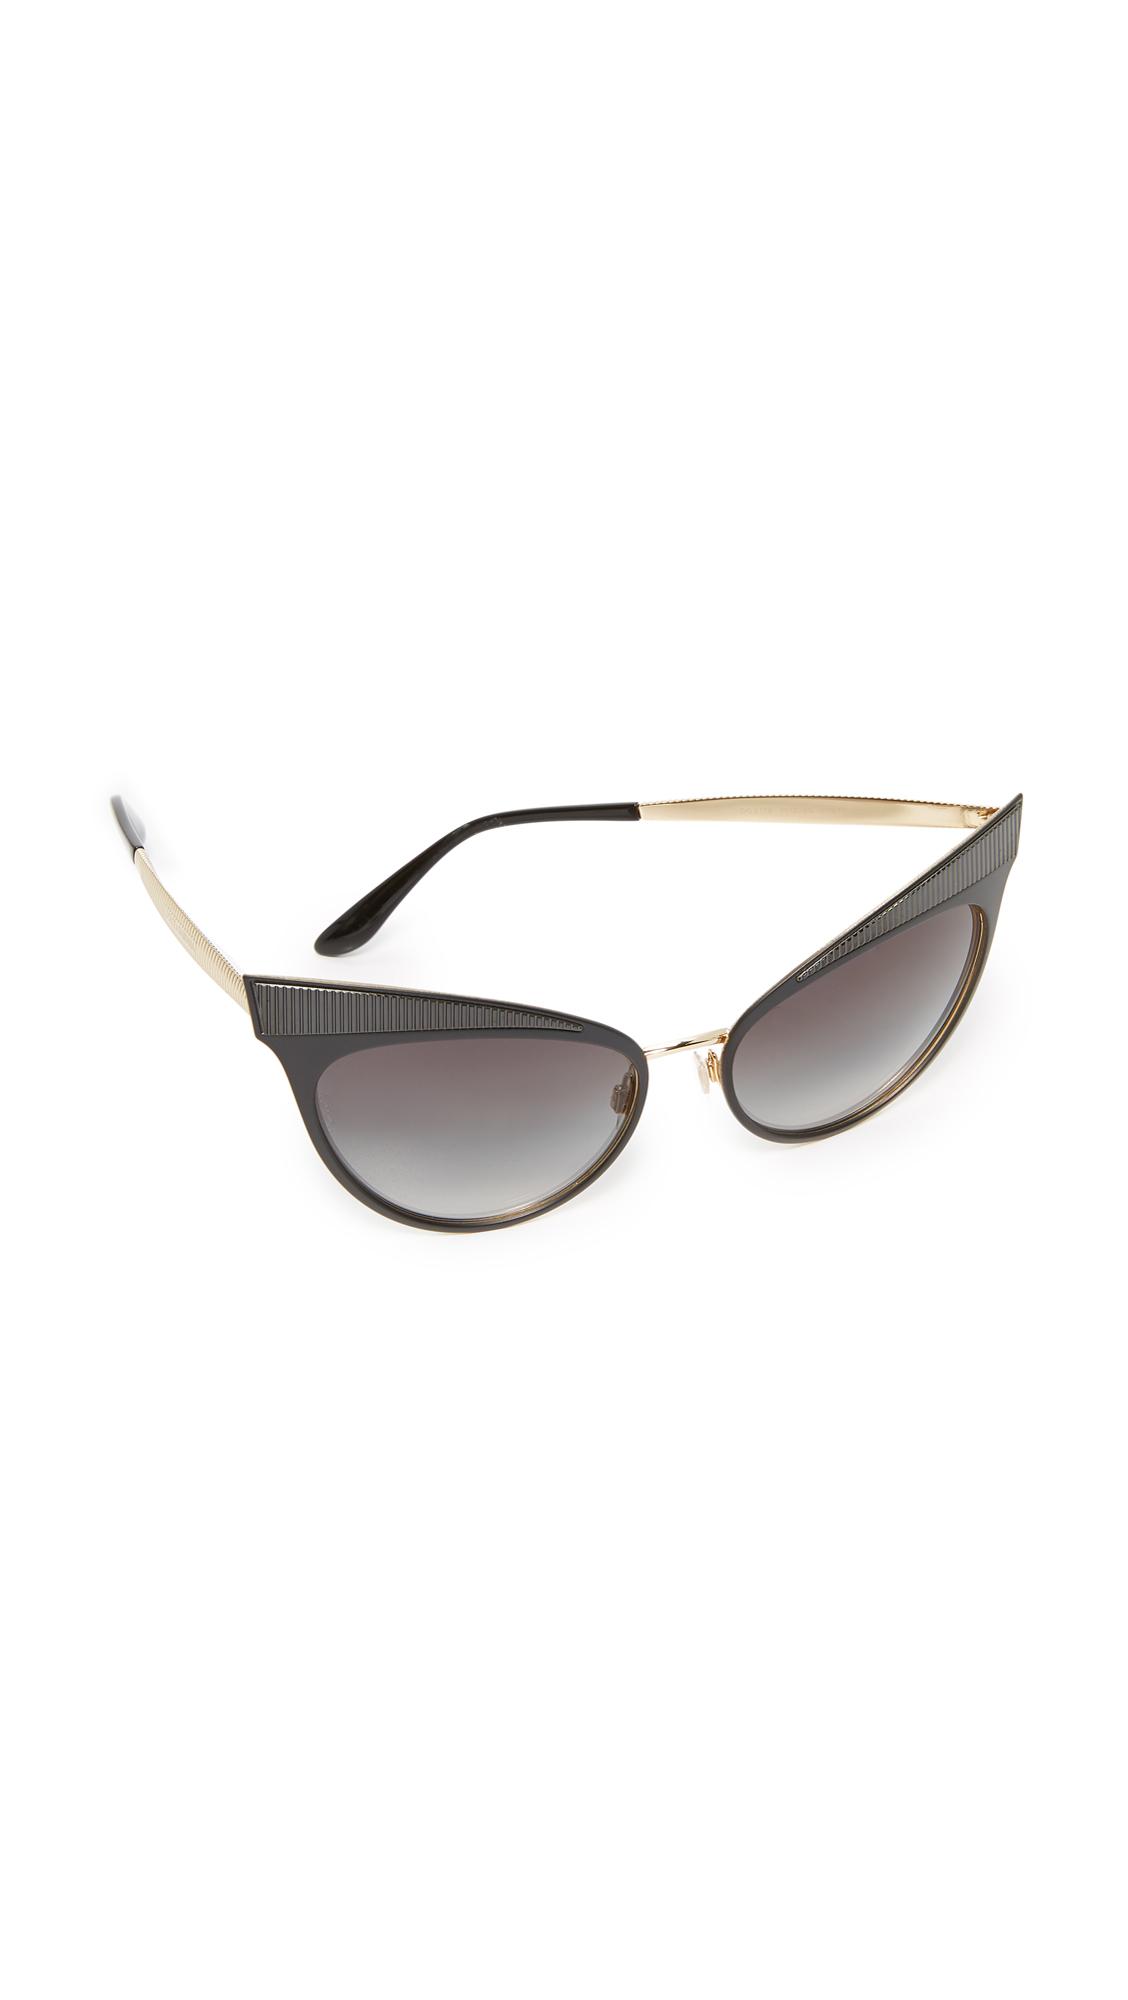 Dolce & Gabbana Grosgrain Cat Eye Sunglasses - Matte Black/Grey